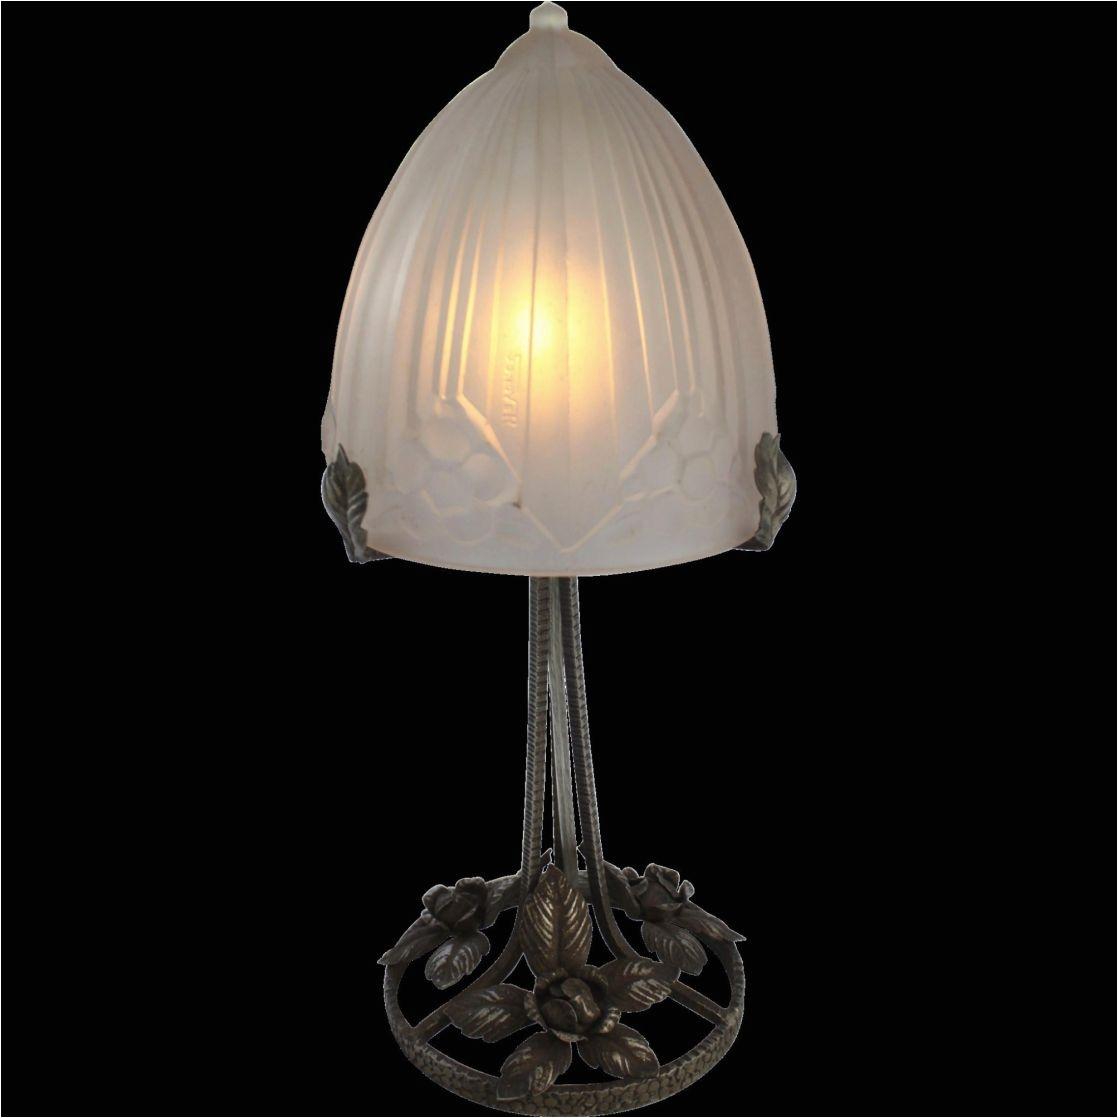 Led Lights for Home Use Creative Home Design Glamorous Brass Light Fixtures Like Led Lights